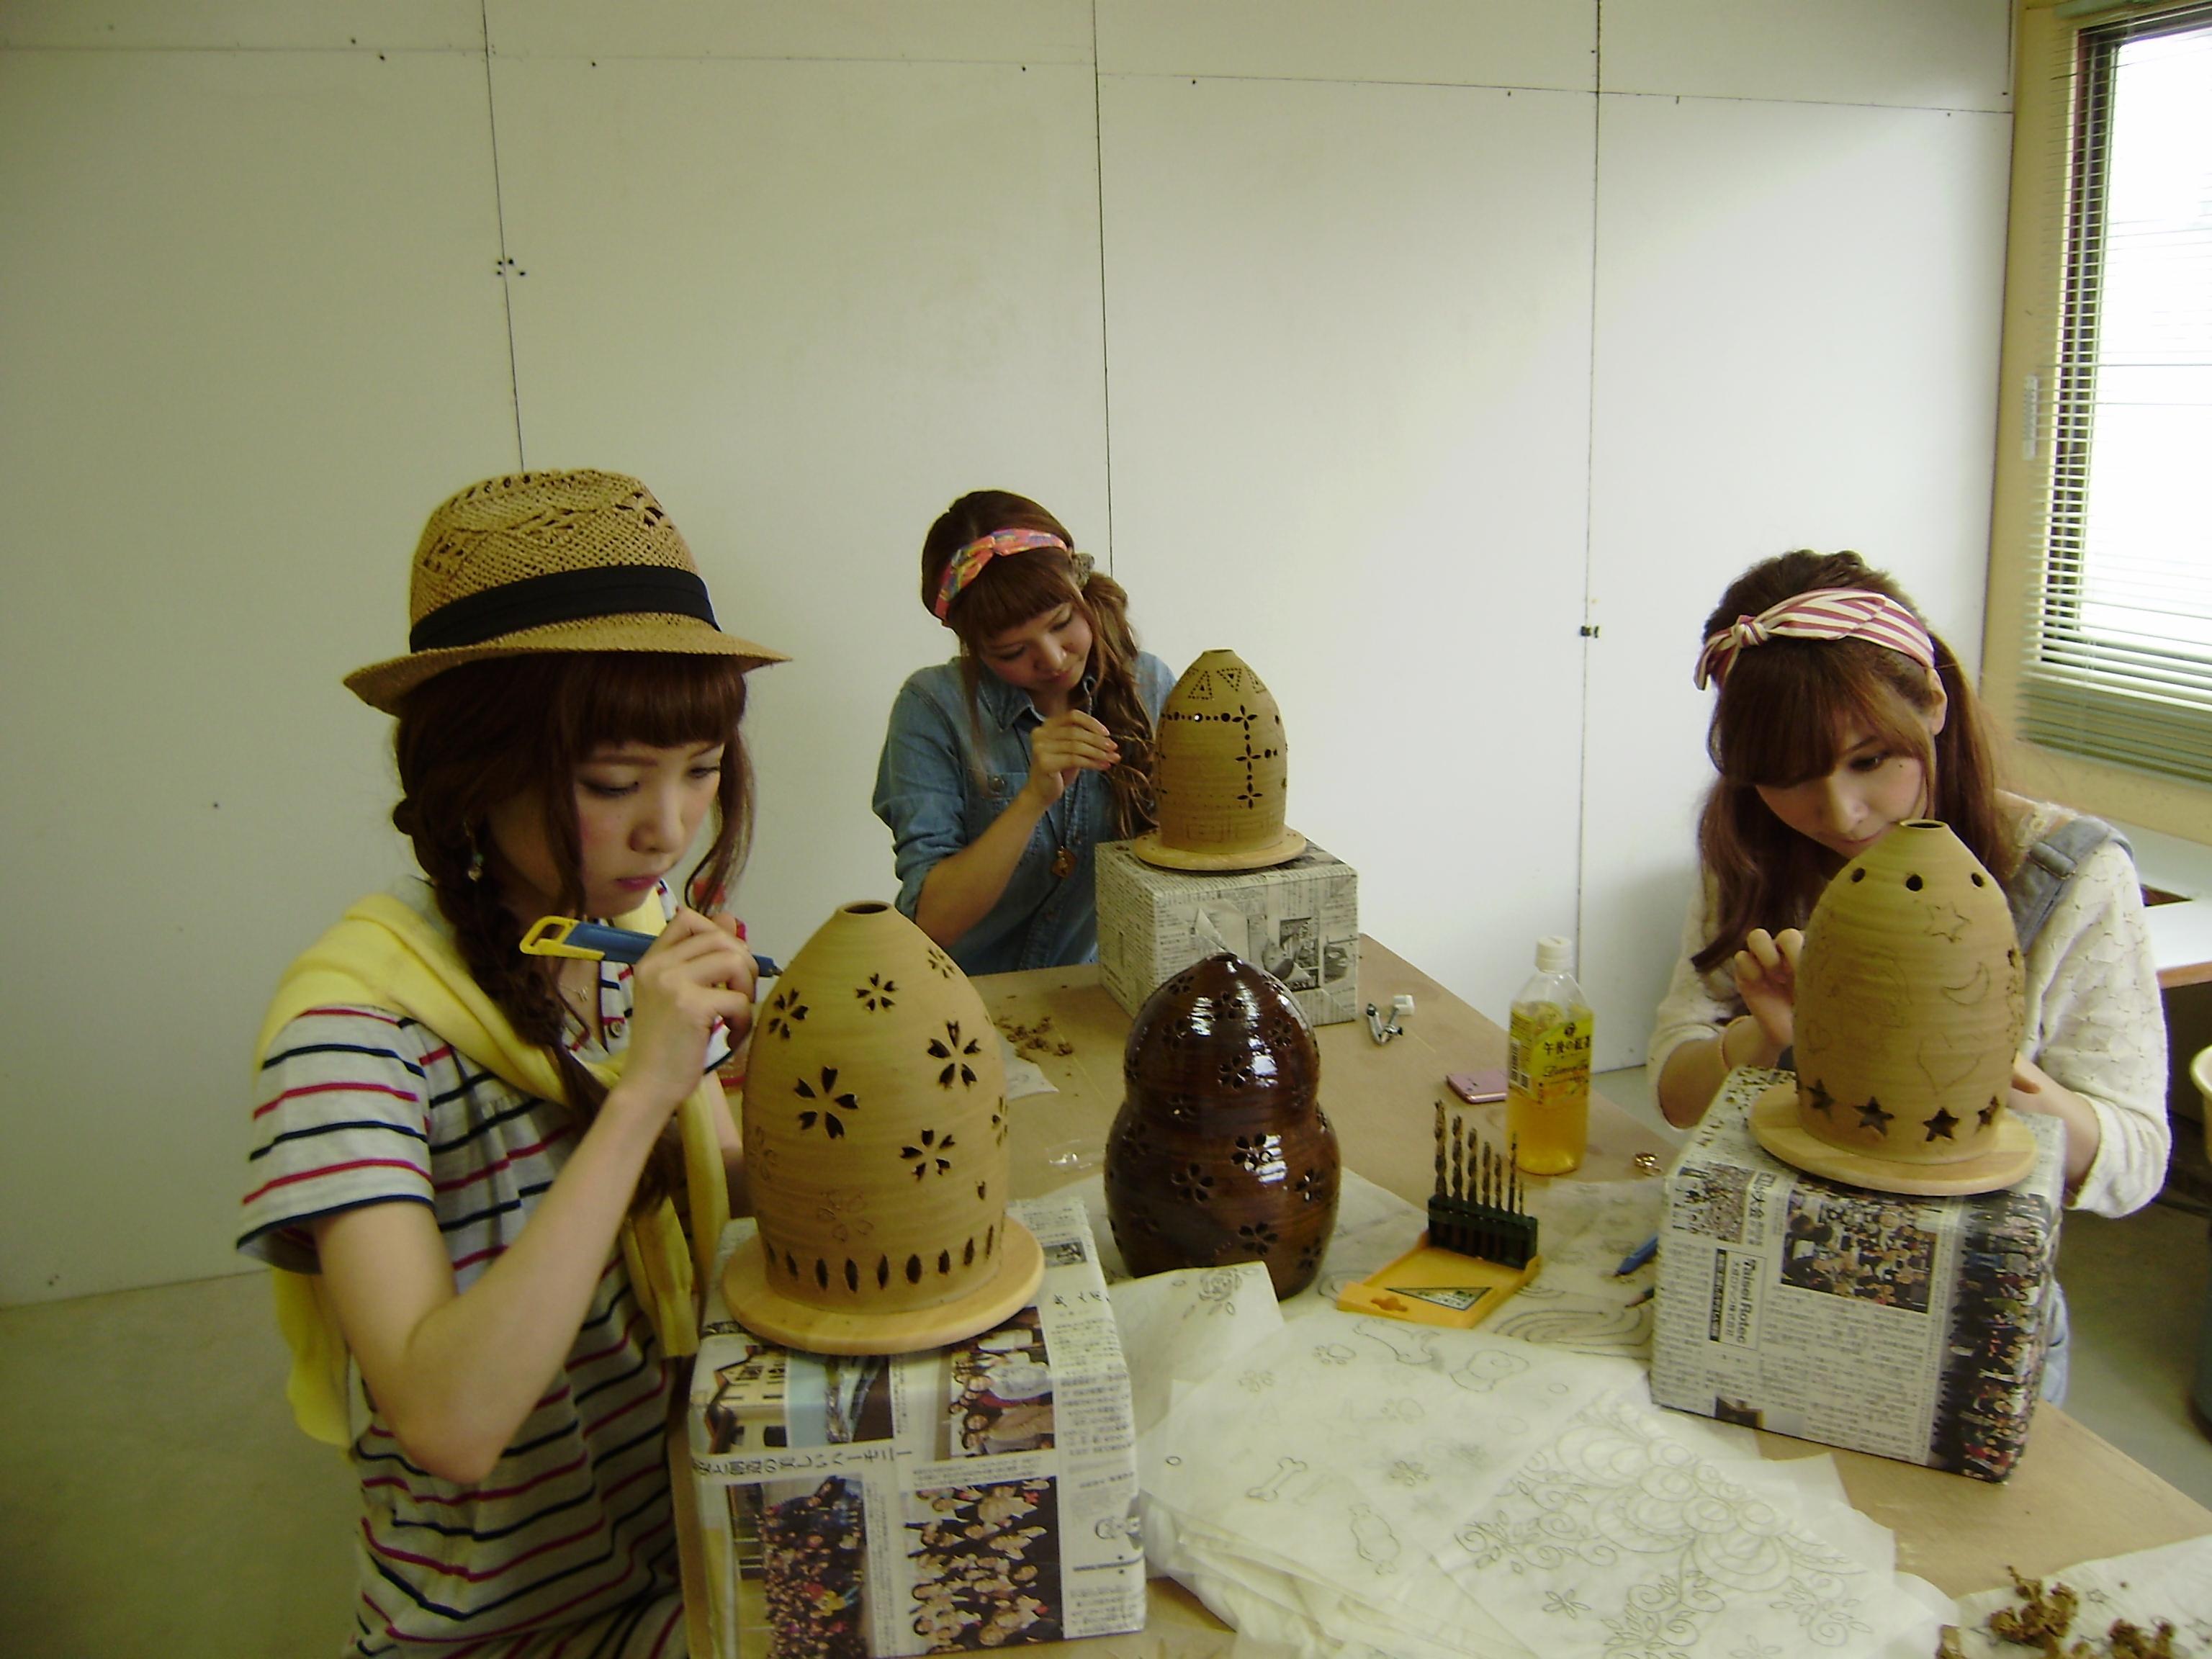 http://www.takeo-kk.net/news/uploads/003.JPG